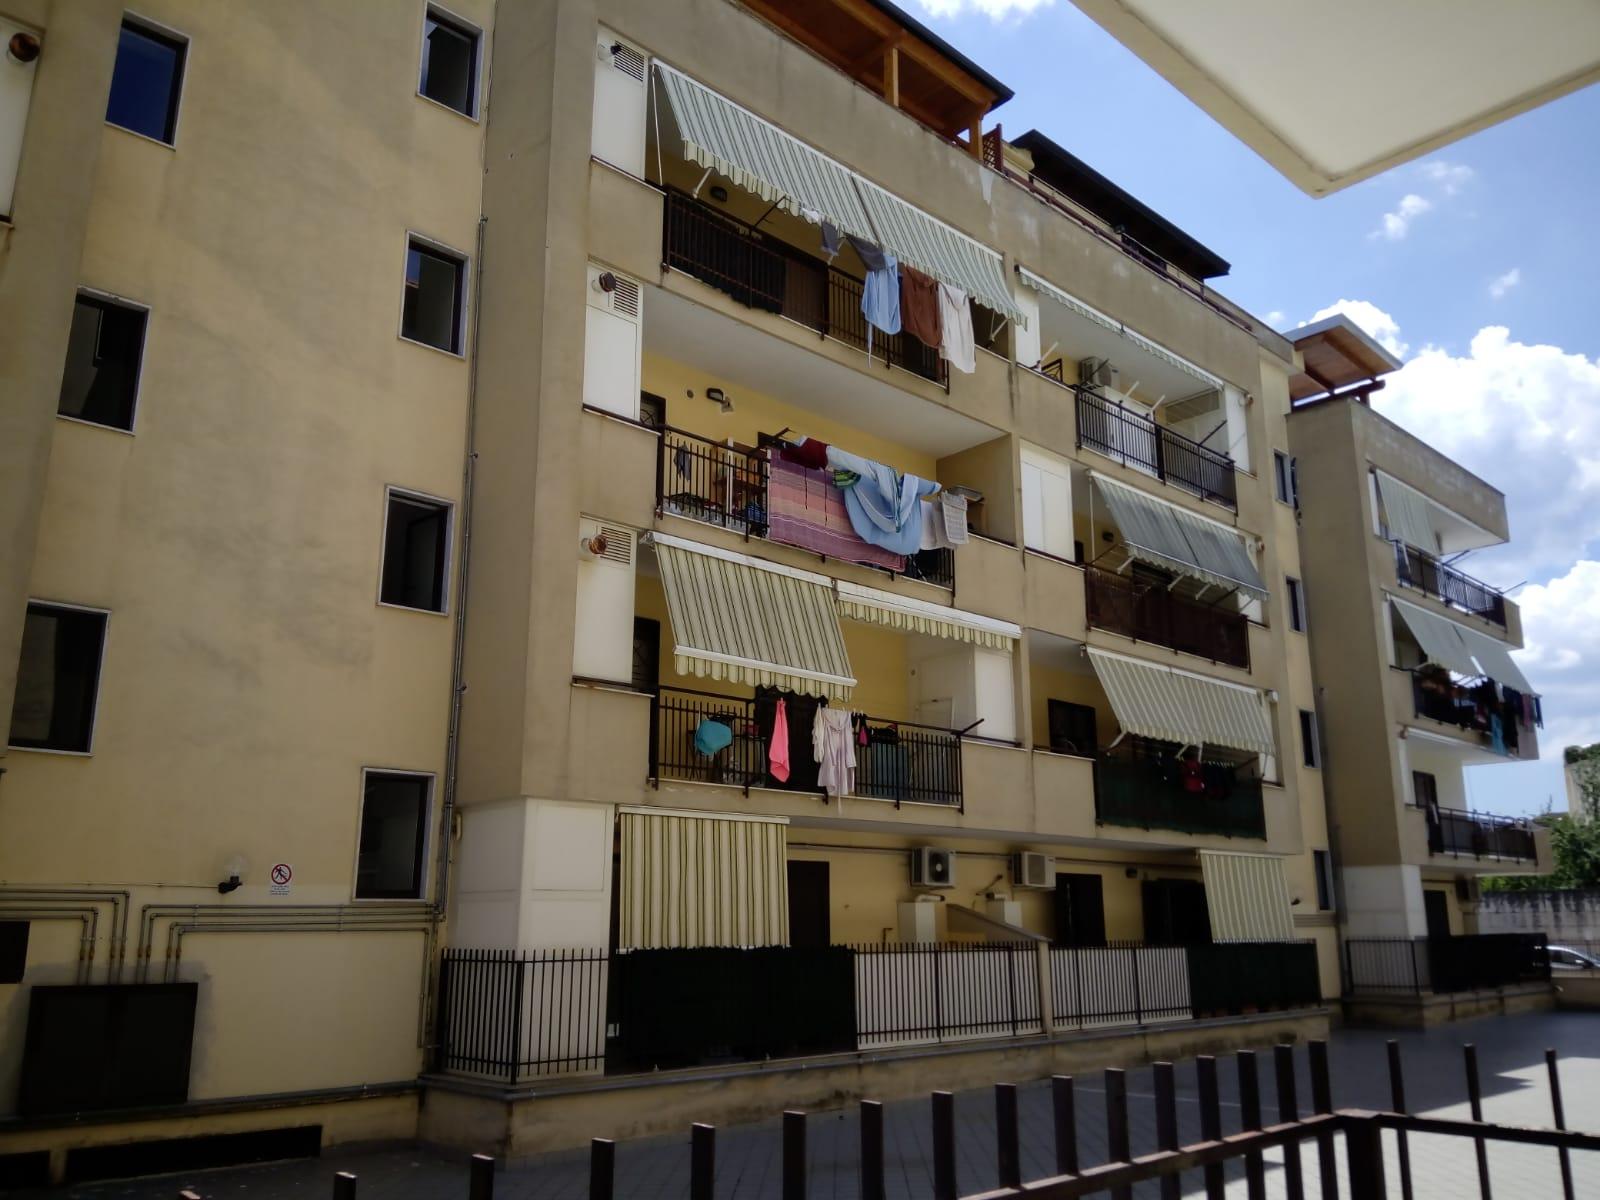 Mugnano centro